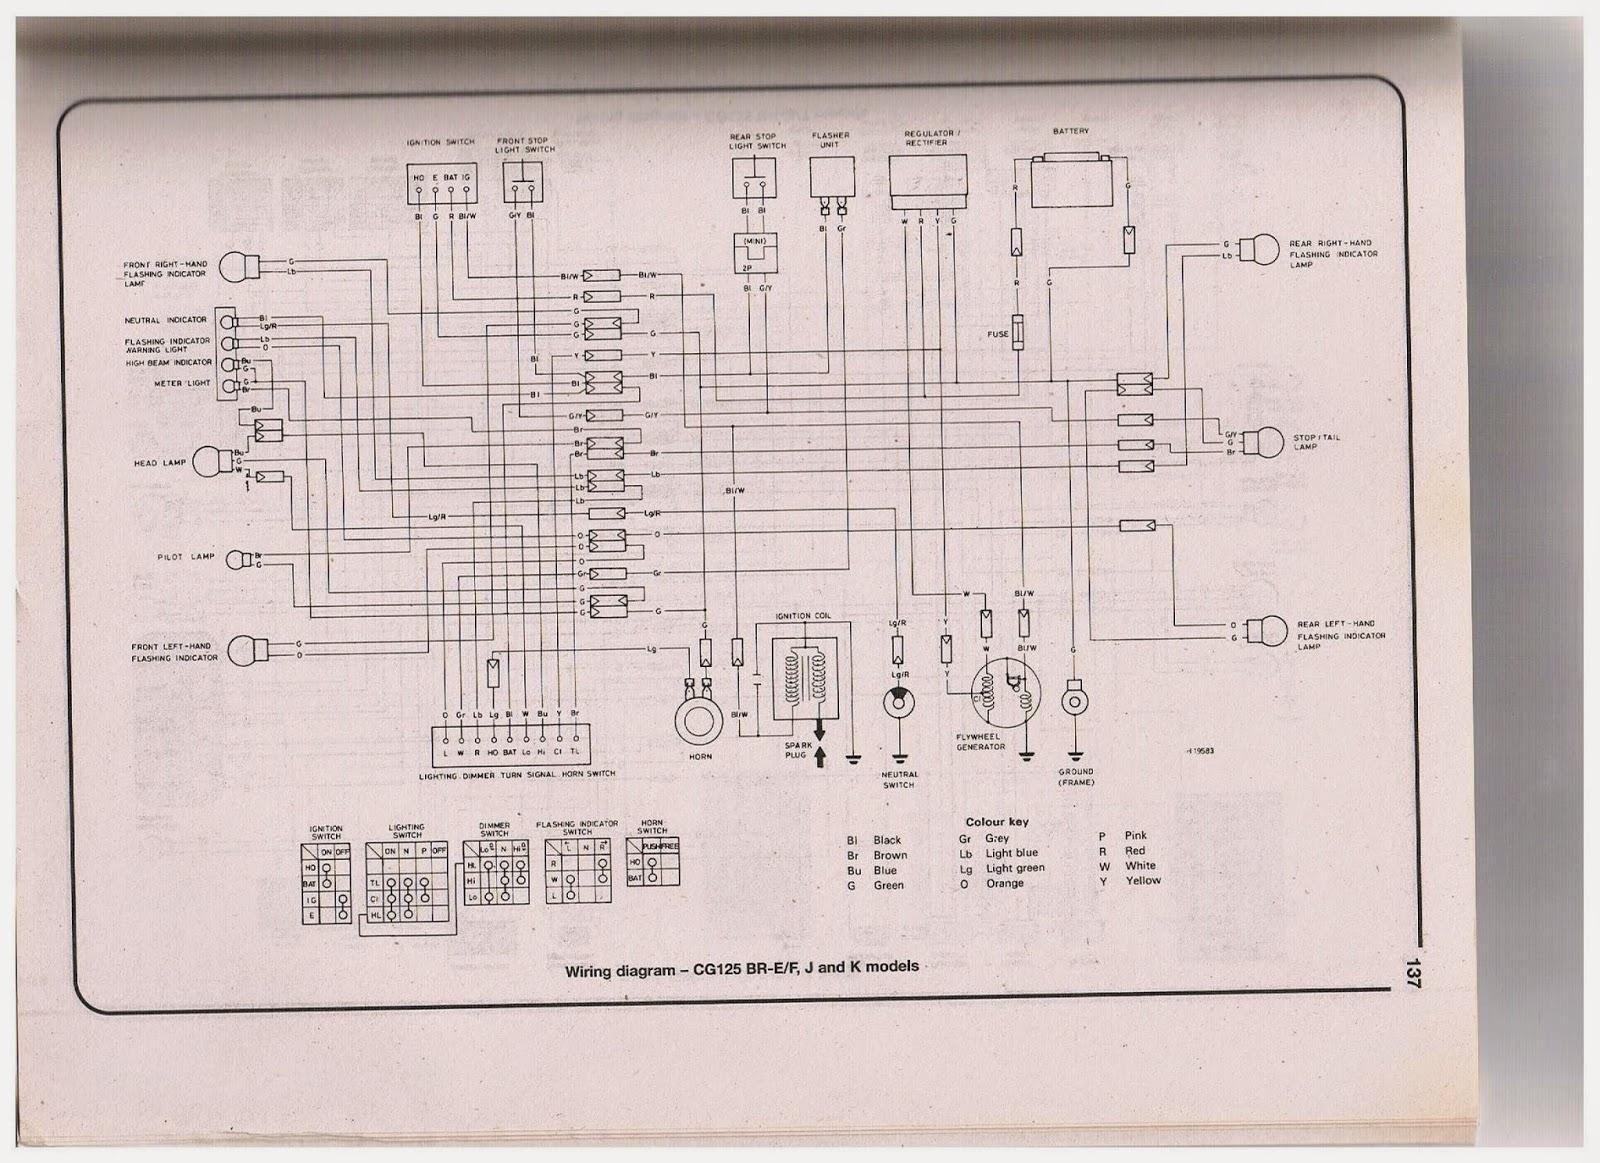 Honda CG 125 Owner Blog : Honda CG 125 wiring diagrams and electrical post